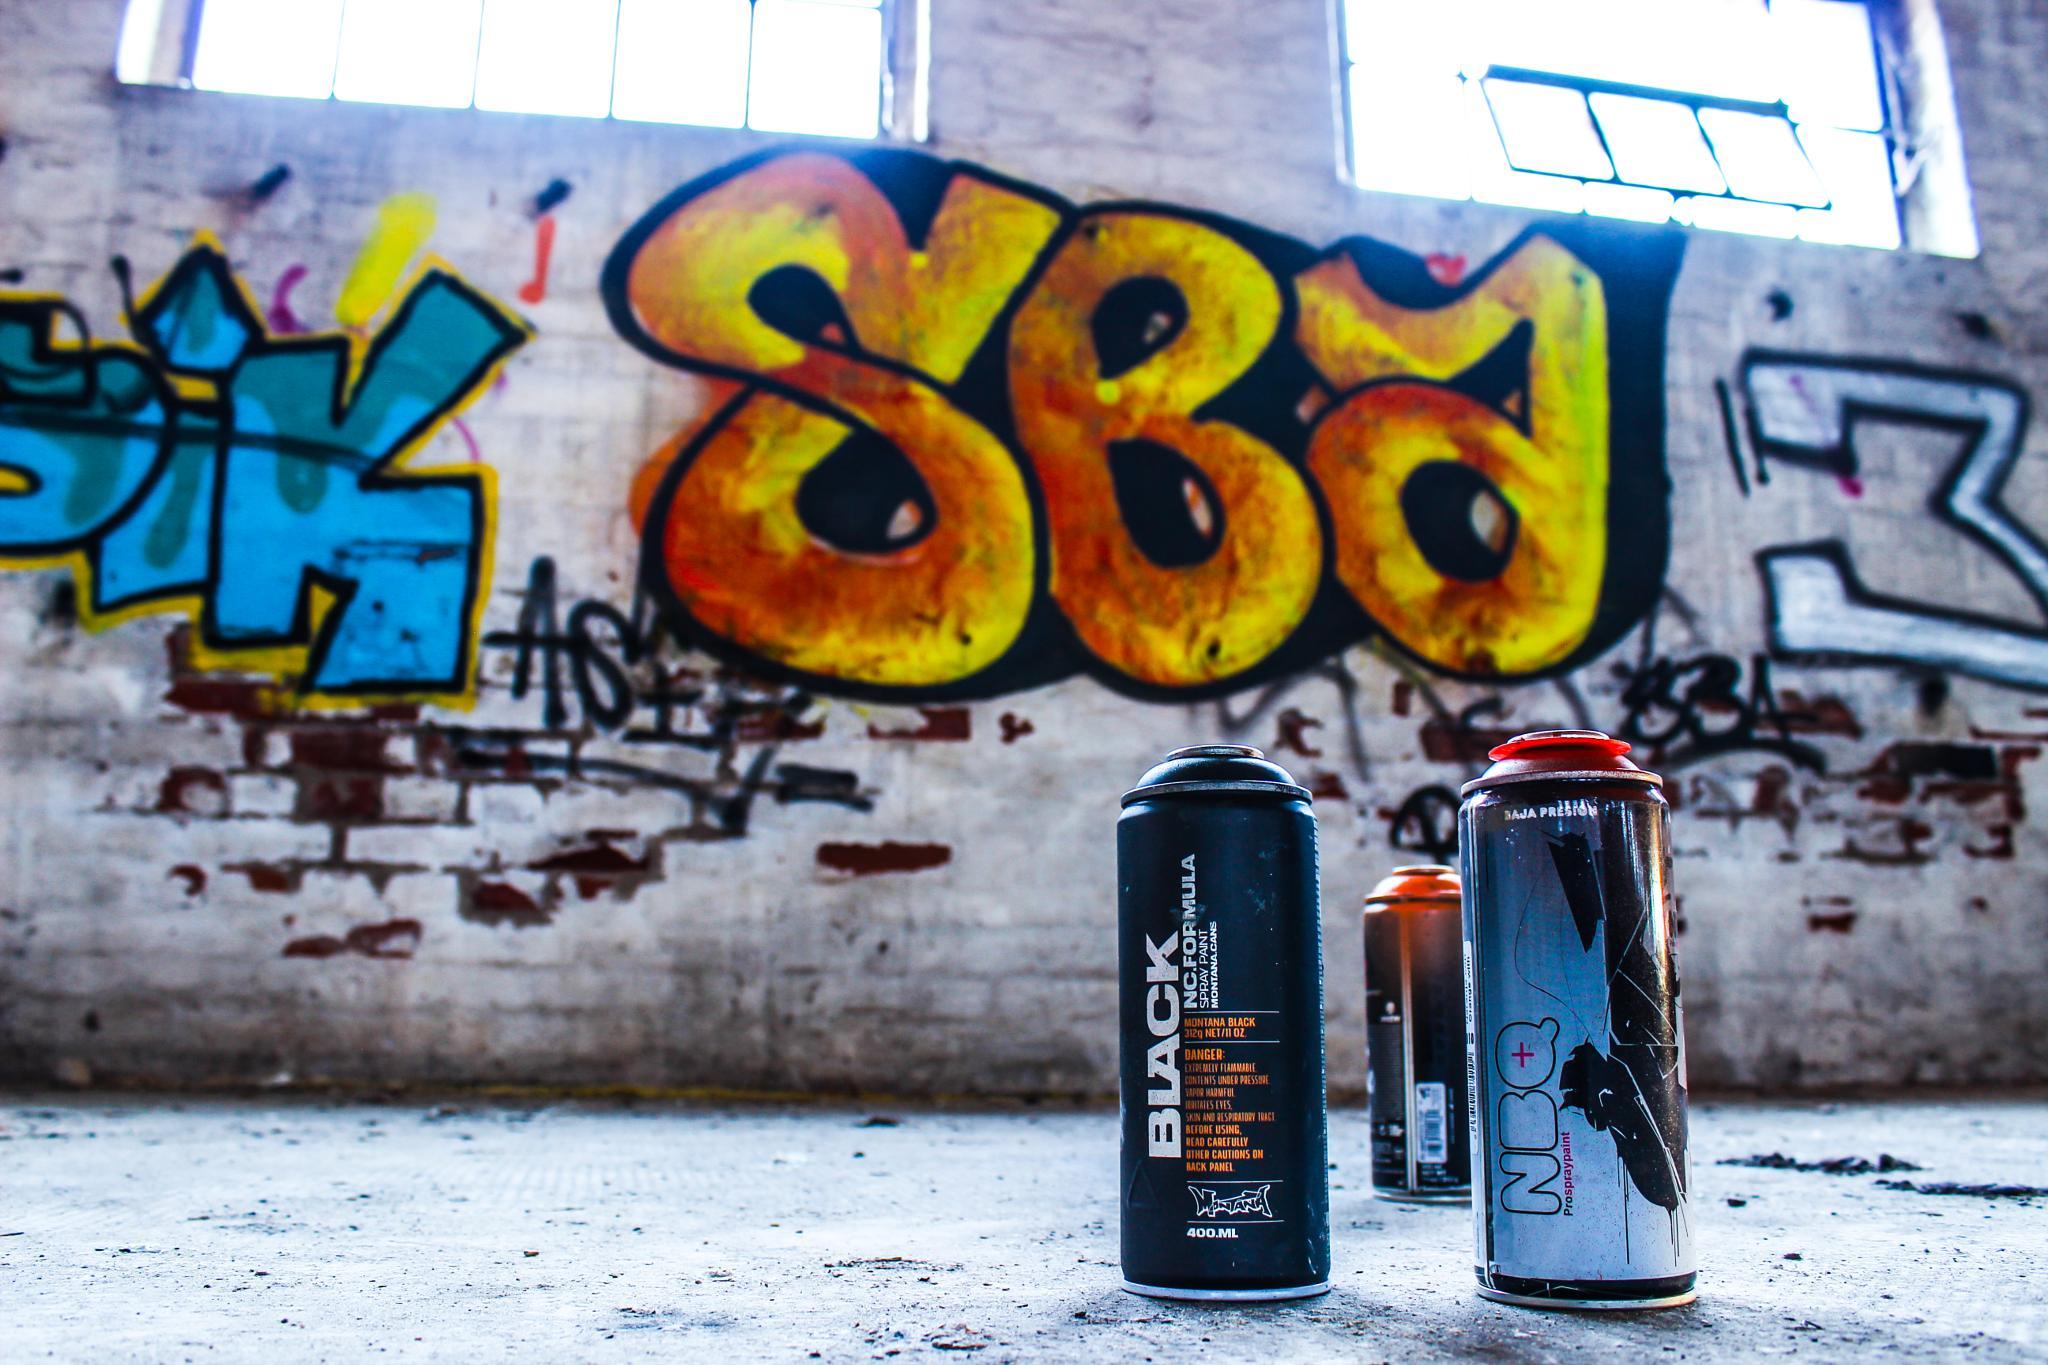 Graffiti by Gold Lumière